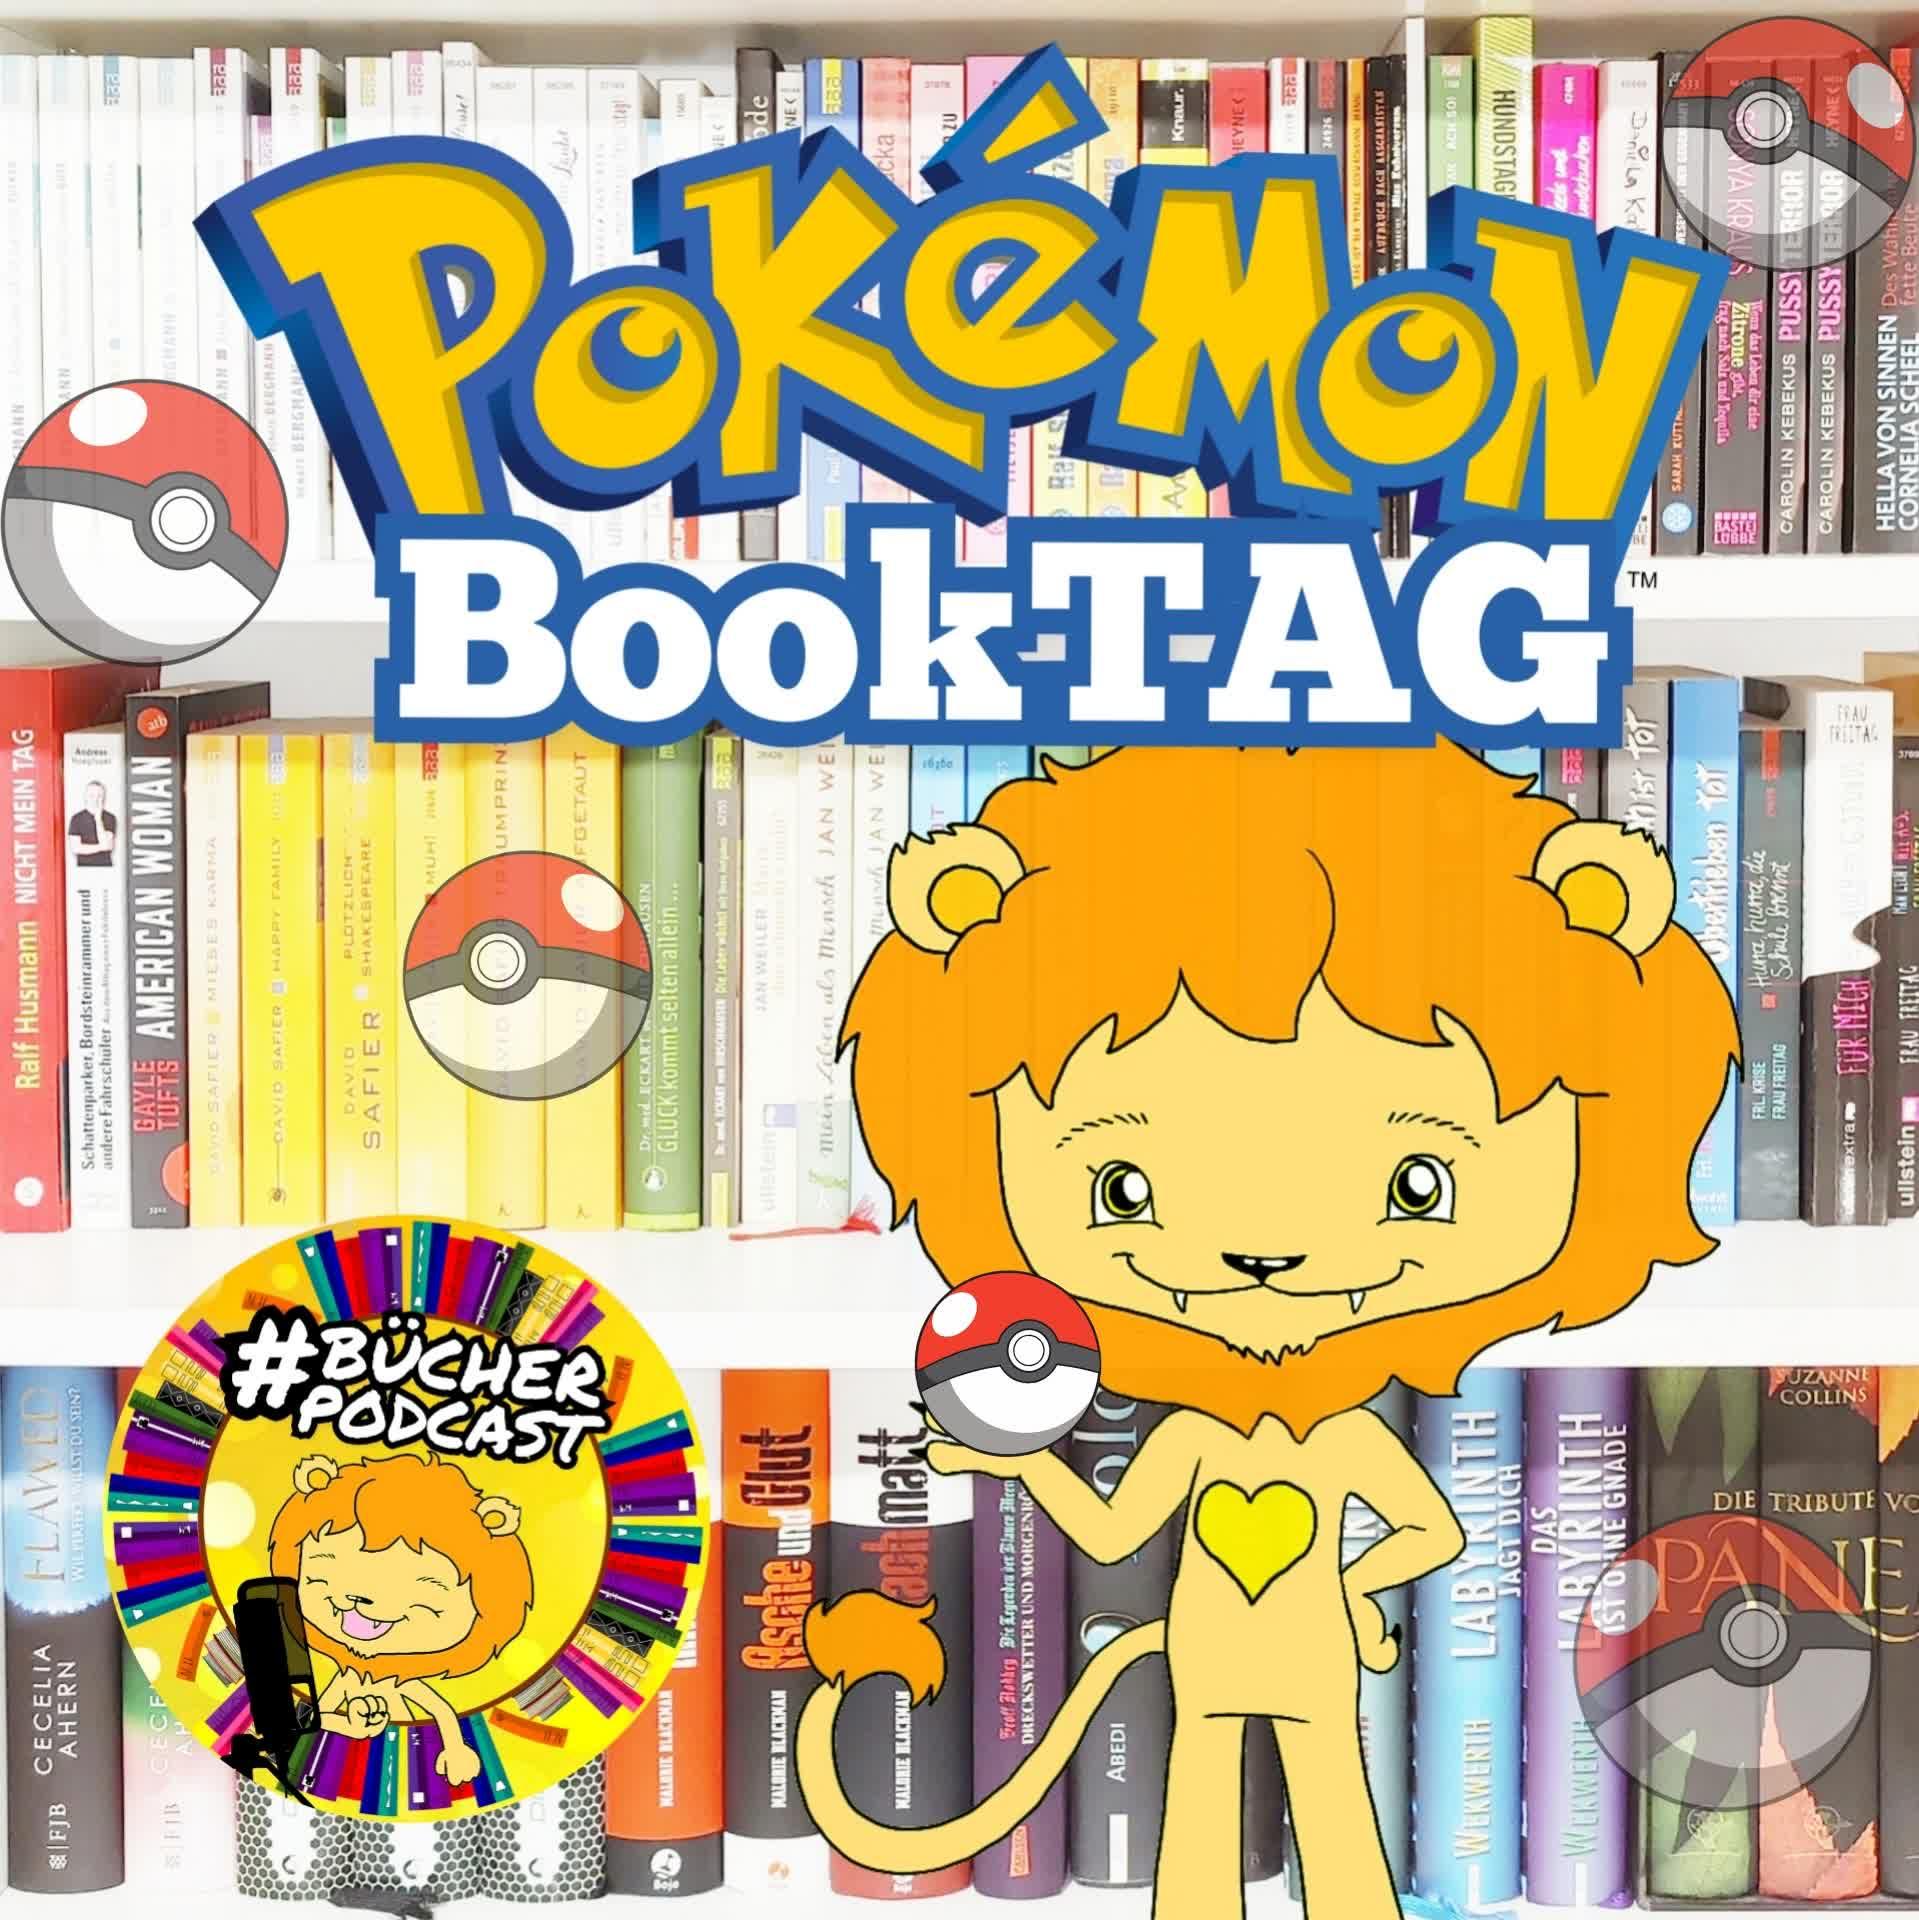 Pokémon BookTAG